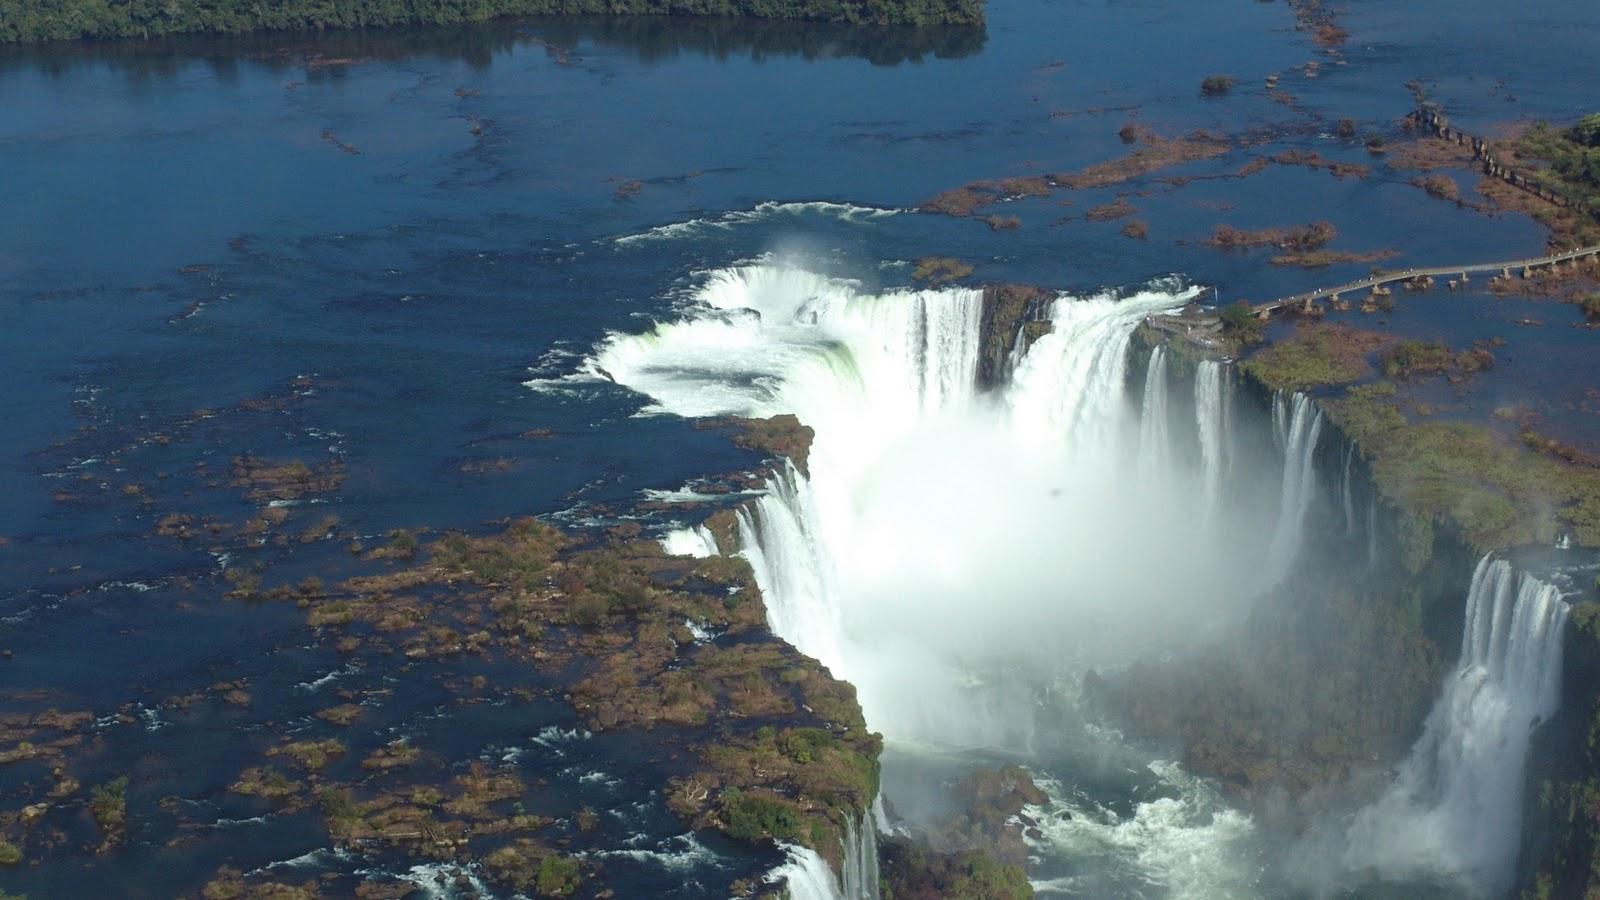 http://2.bp.blogspot.com/-4-q1EjXG-Ao/TpavljAox4I/AAAAAAAAAMs/7xNLpWdL0mo/s1600/Waterfall+wallpaper+%25281%2529.jpg